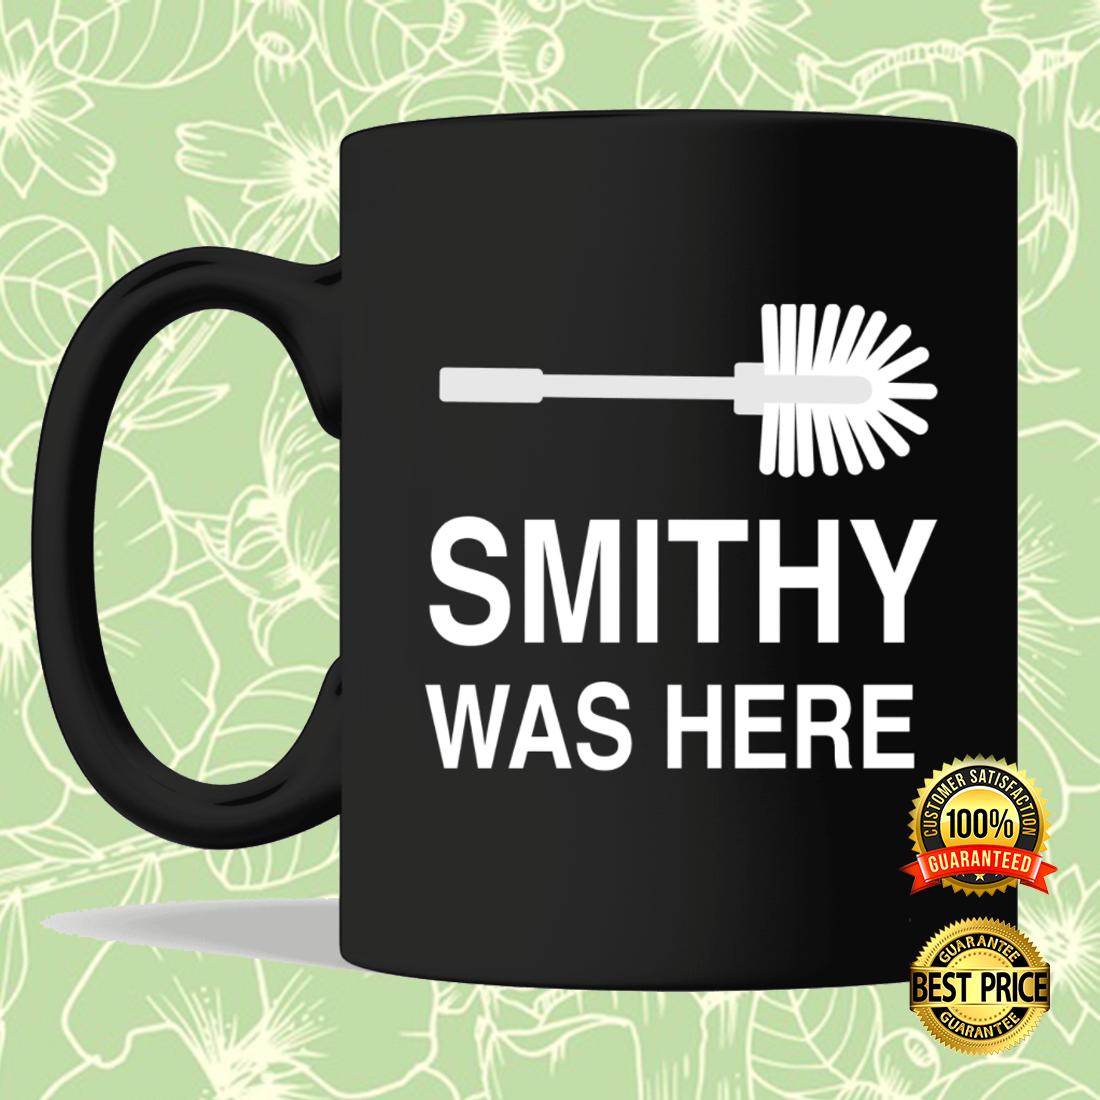 Smithy was here mug 3